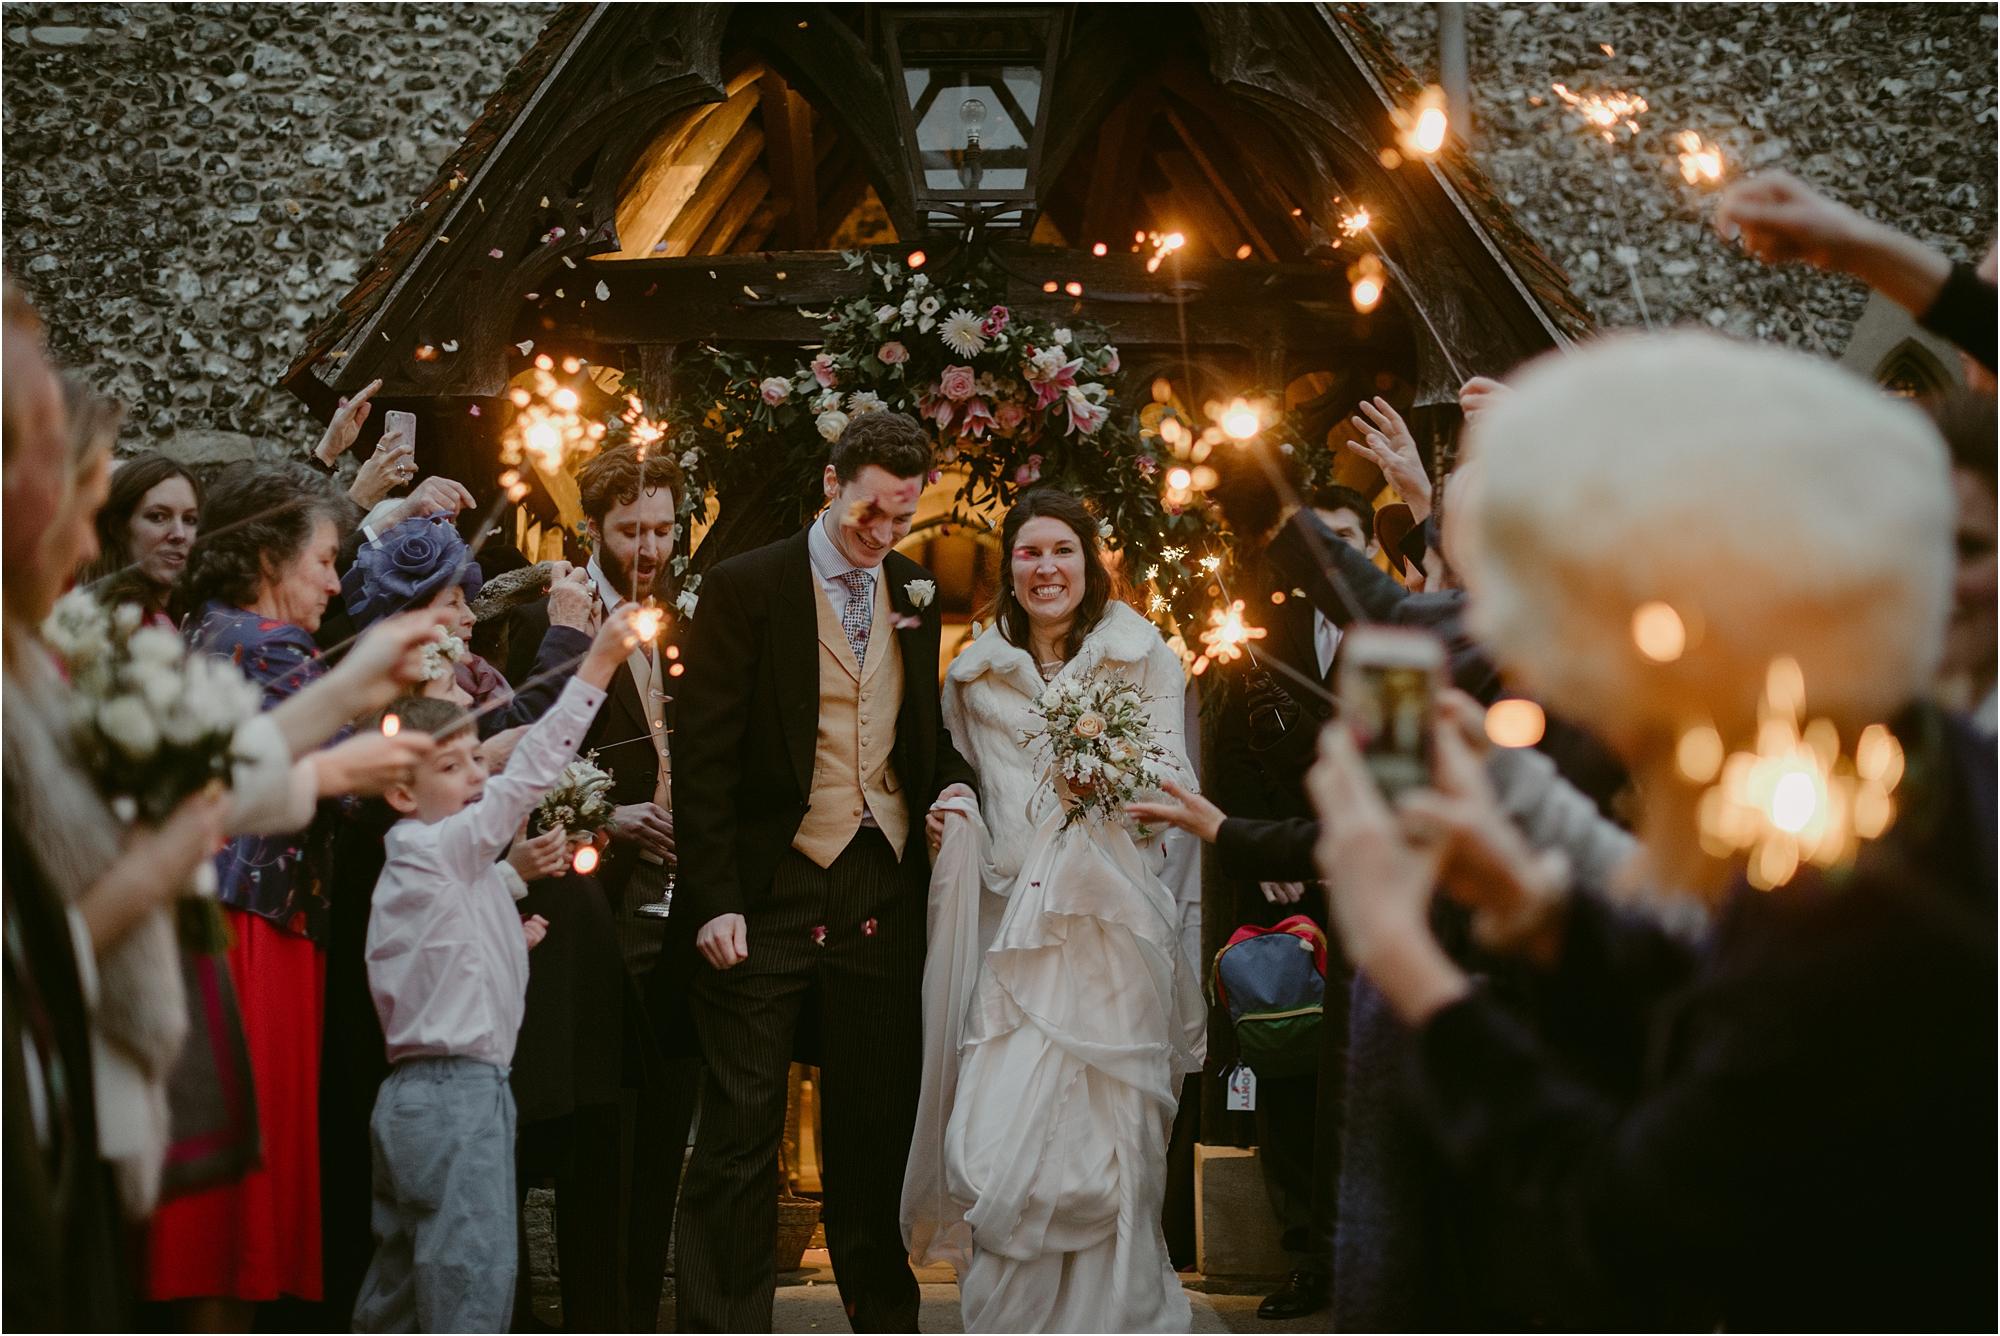 Rose+Harry-outdoor-english-wedding-photography__0084.jpg